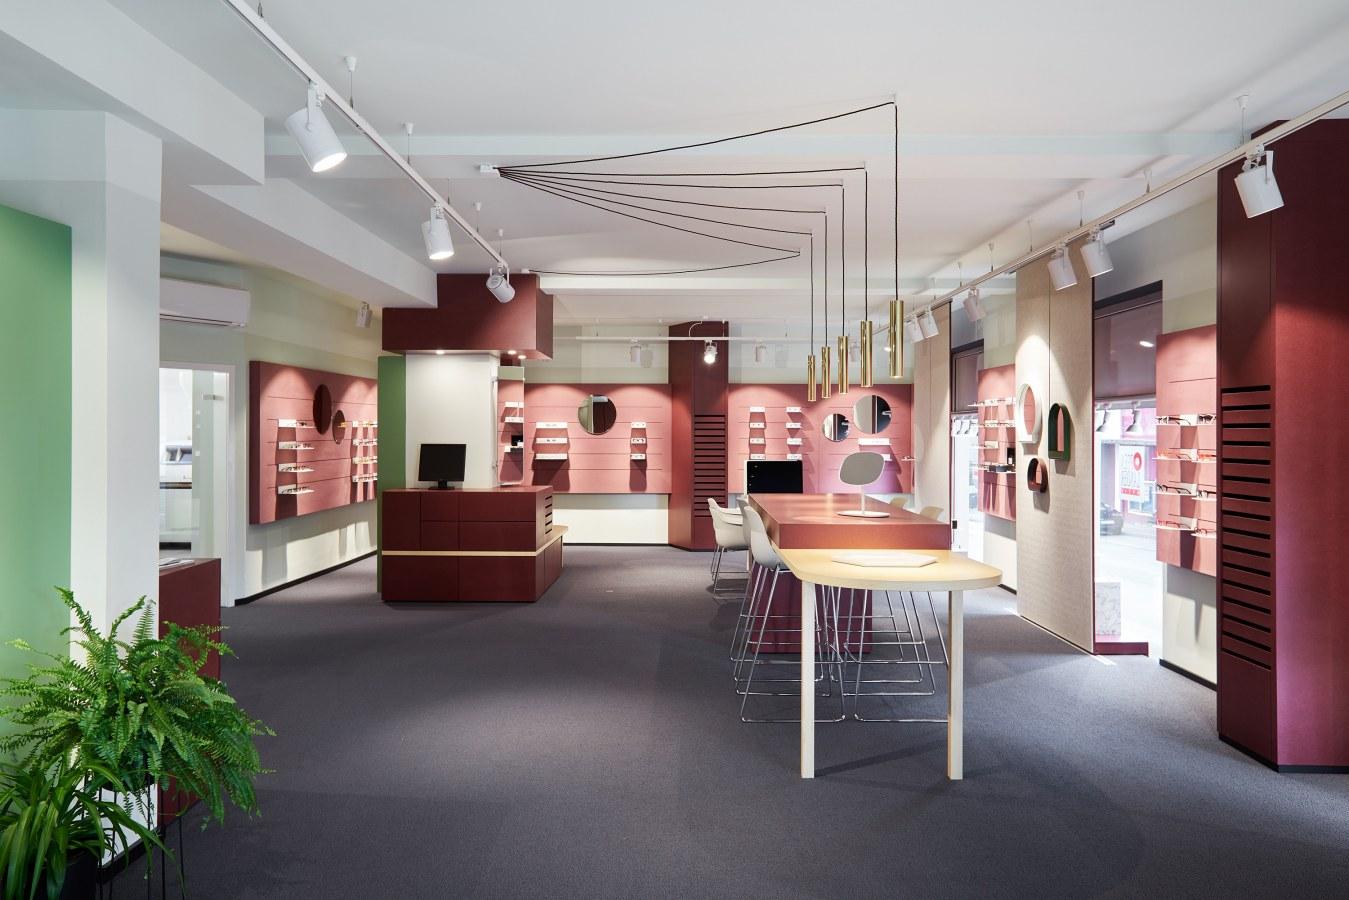 Isabell-Ehring-Innenarchitektur-Stuttgart---Umbau Ladenfläche-OPPENLÄNDEROPTIK-1.jpg